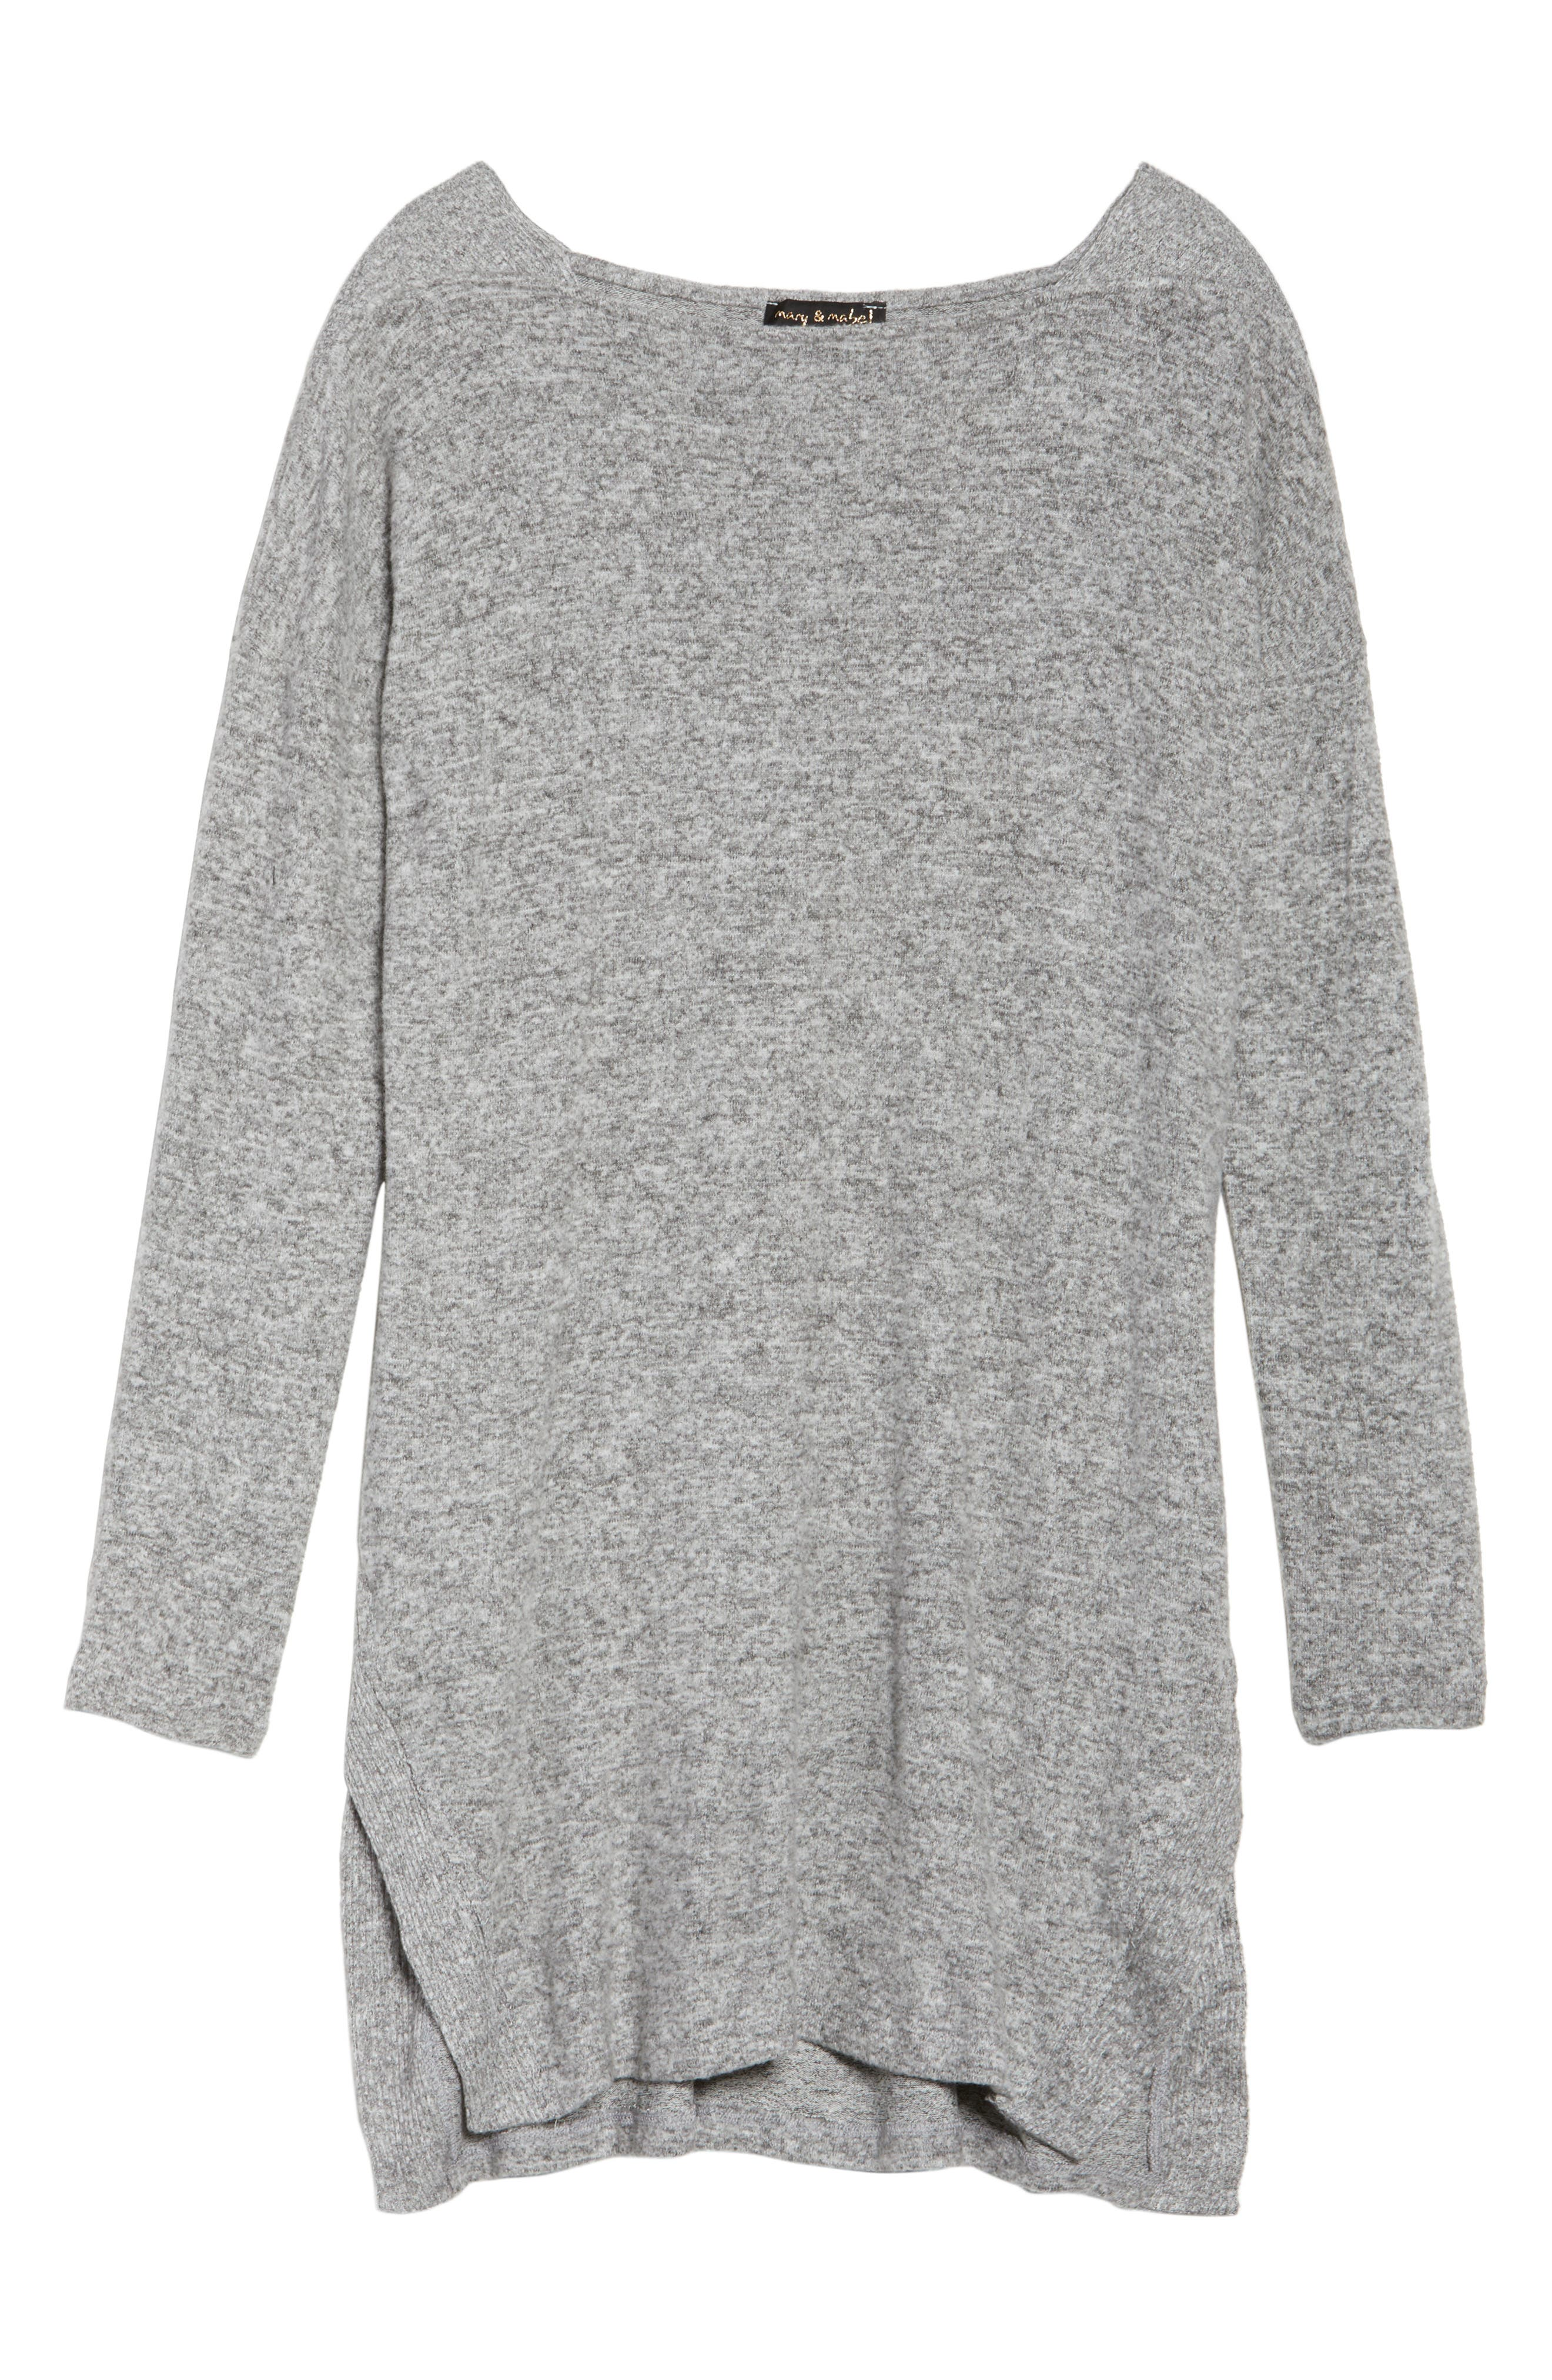 Sweater Dress,                             Alternate thumbnail 6, color,                             Grey